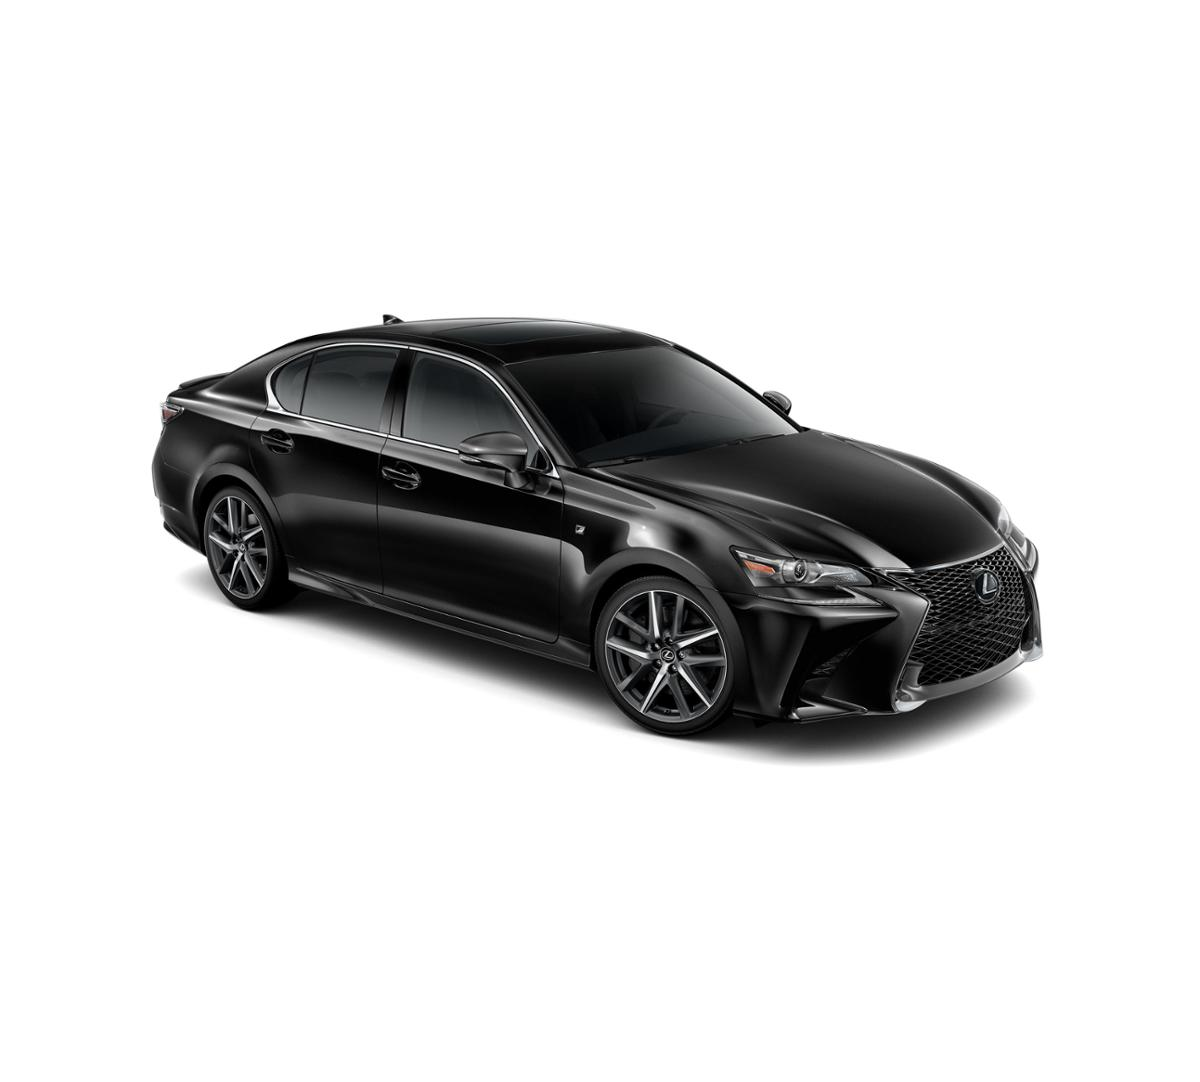 Lexus Gs For Sale: Freehold Caviar 2019 Lexus GS 350 New For Sale